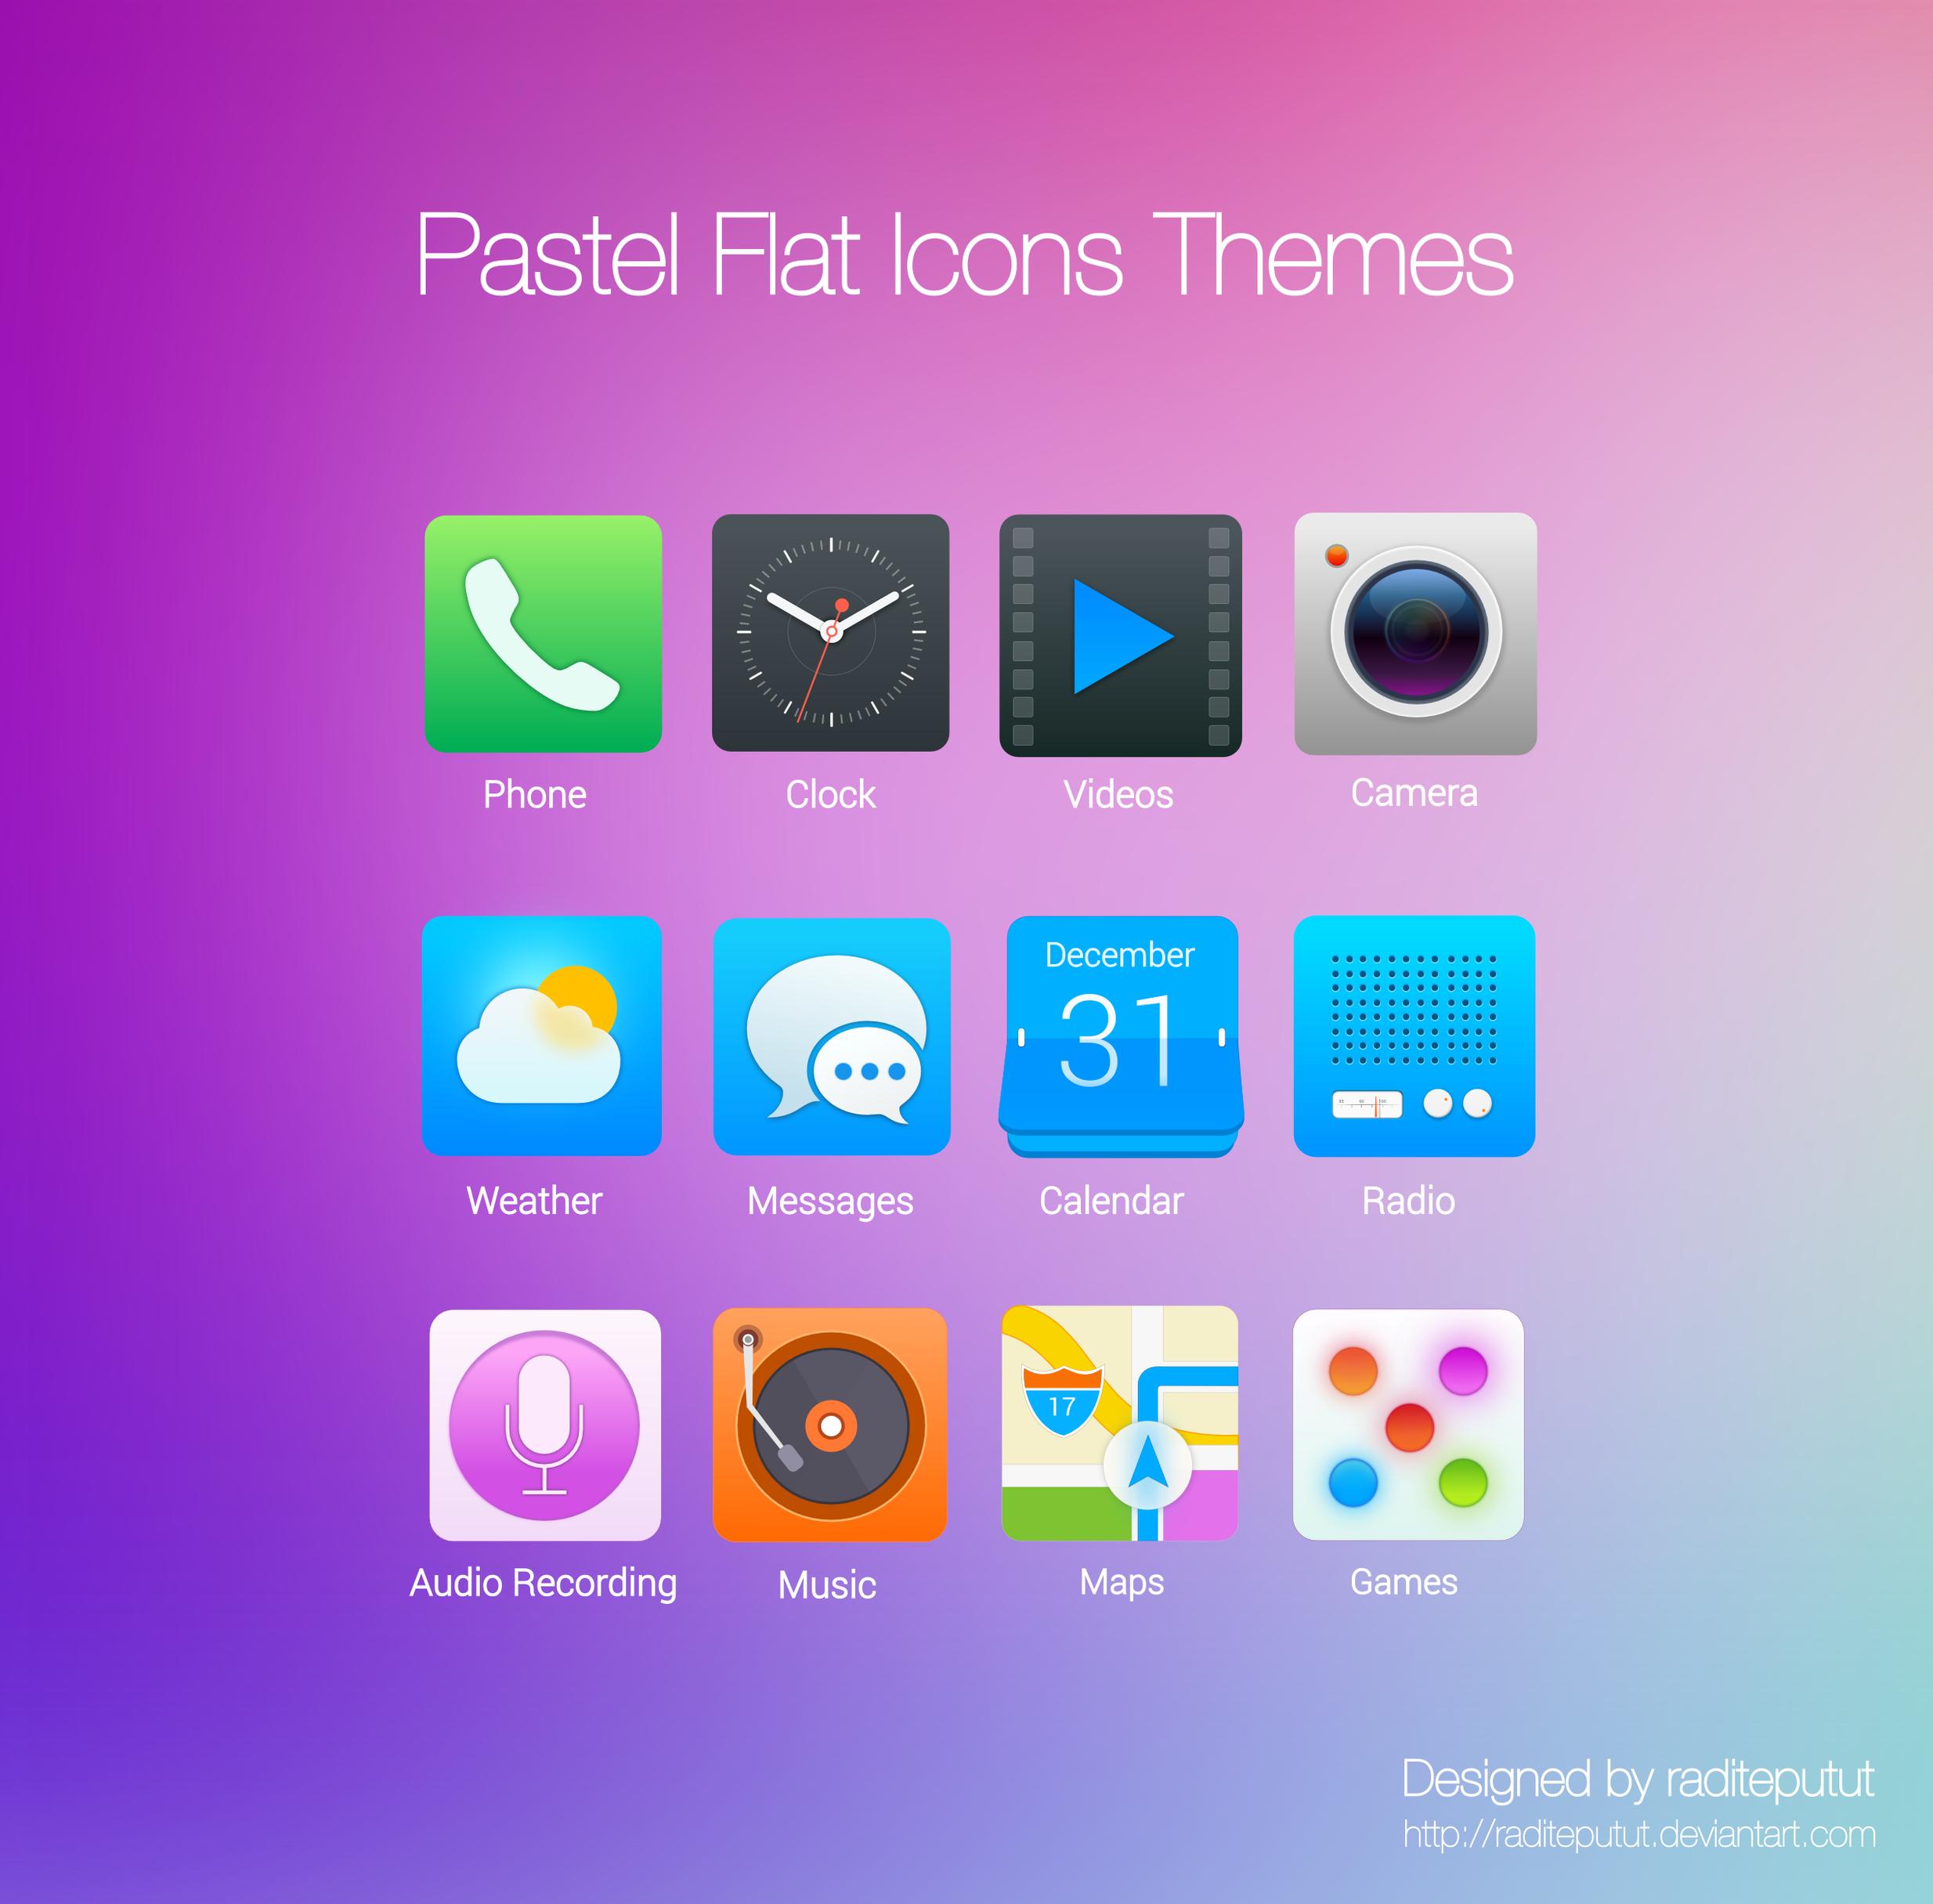 Pastel Flat Icons Themes by raditeputut